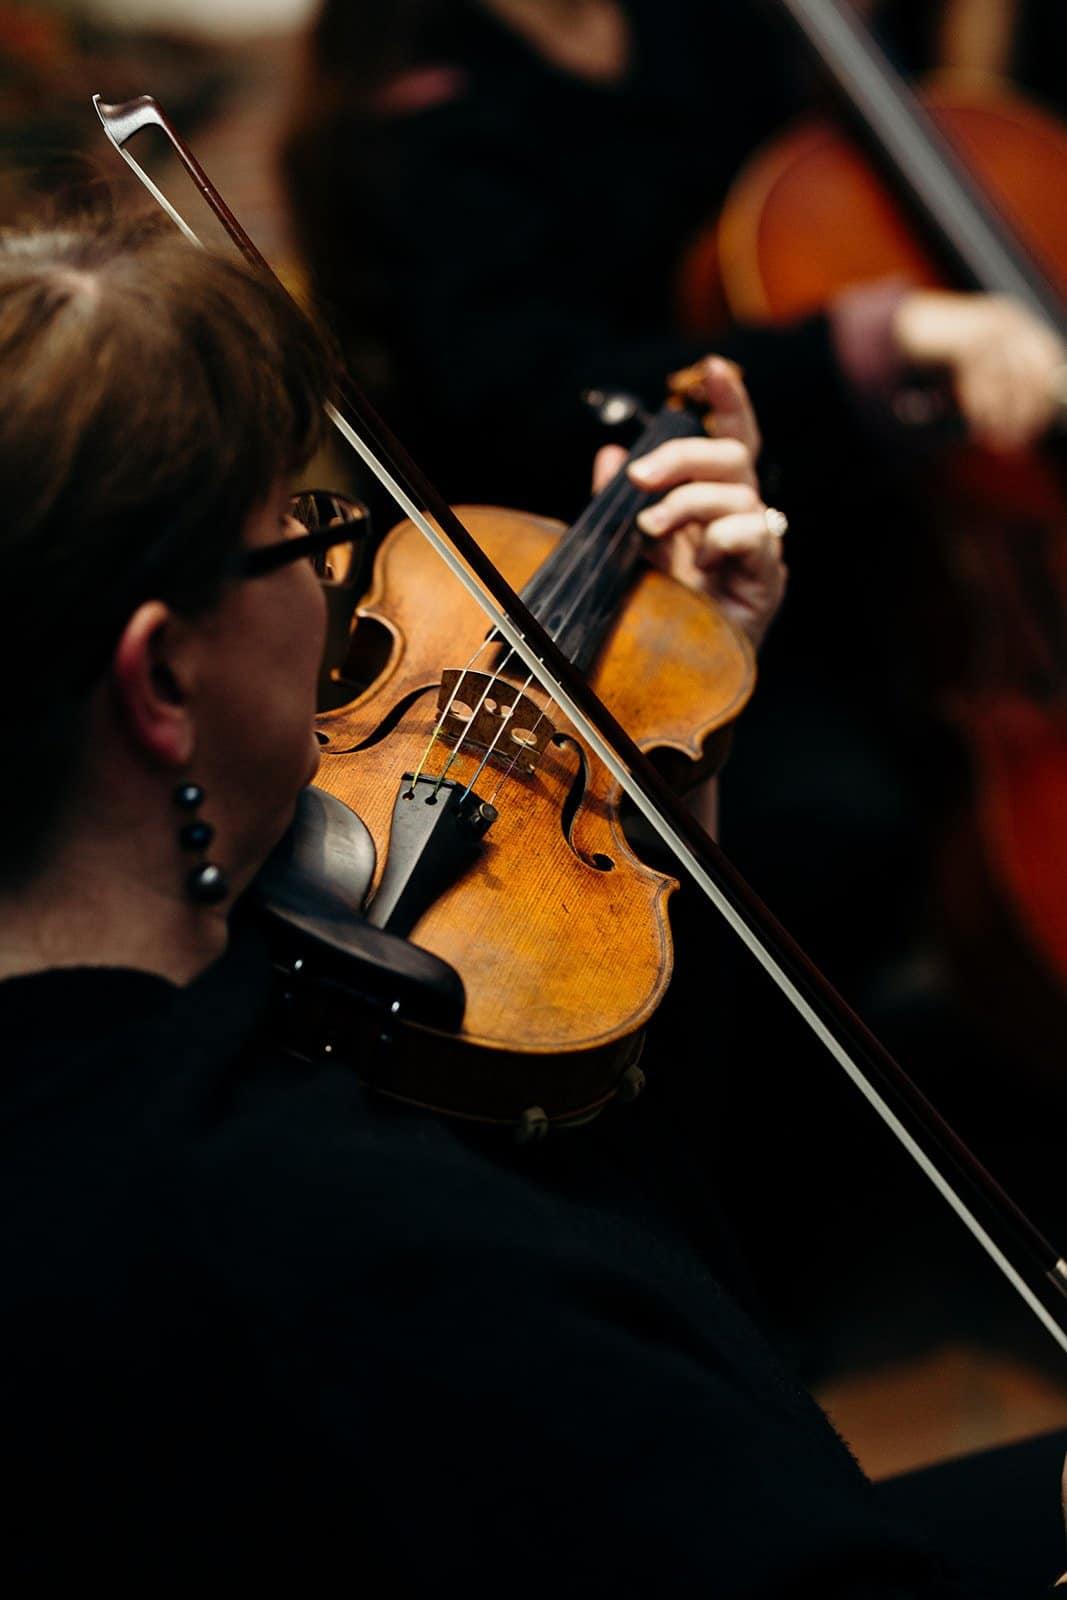 Women plays violin